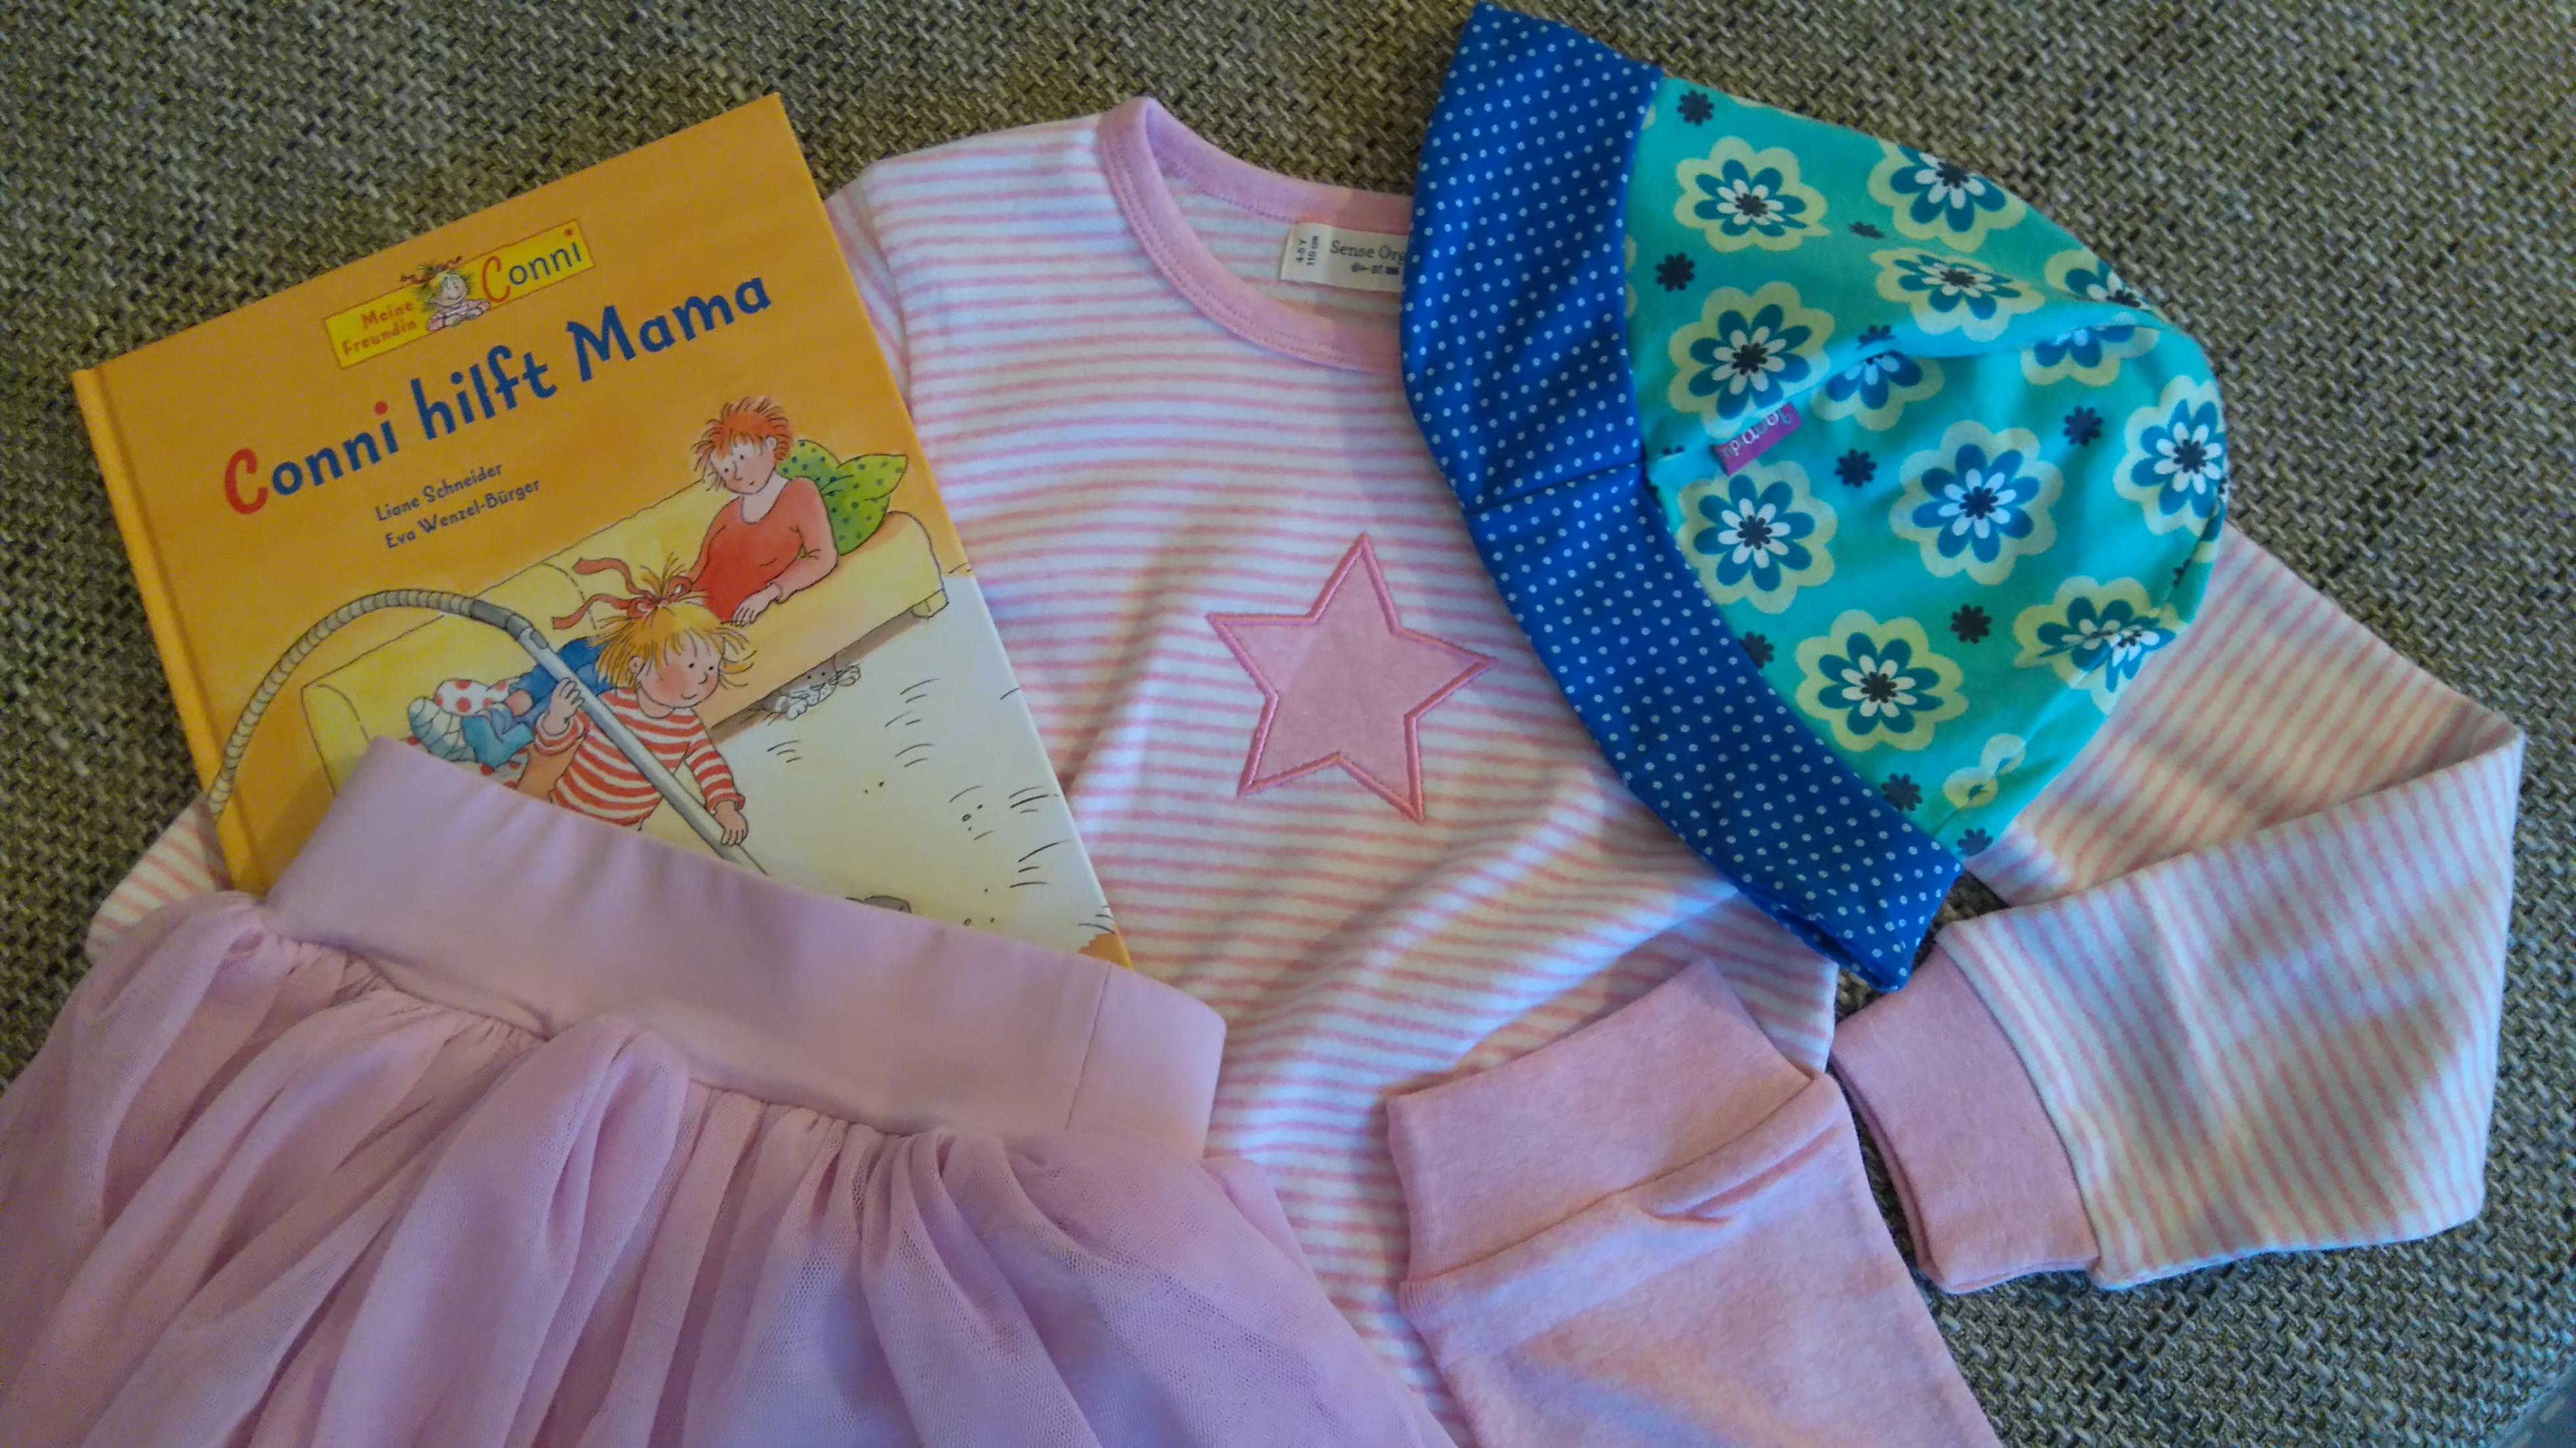 Loopidu Hut Pyjama Rock Emma und Paul Conni hilft Mama Buch